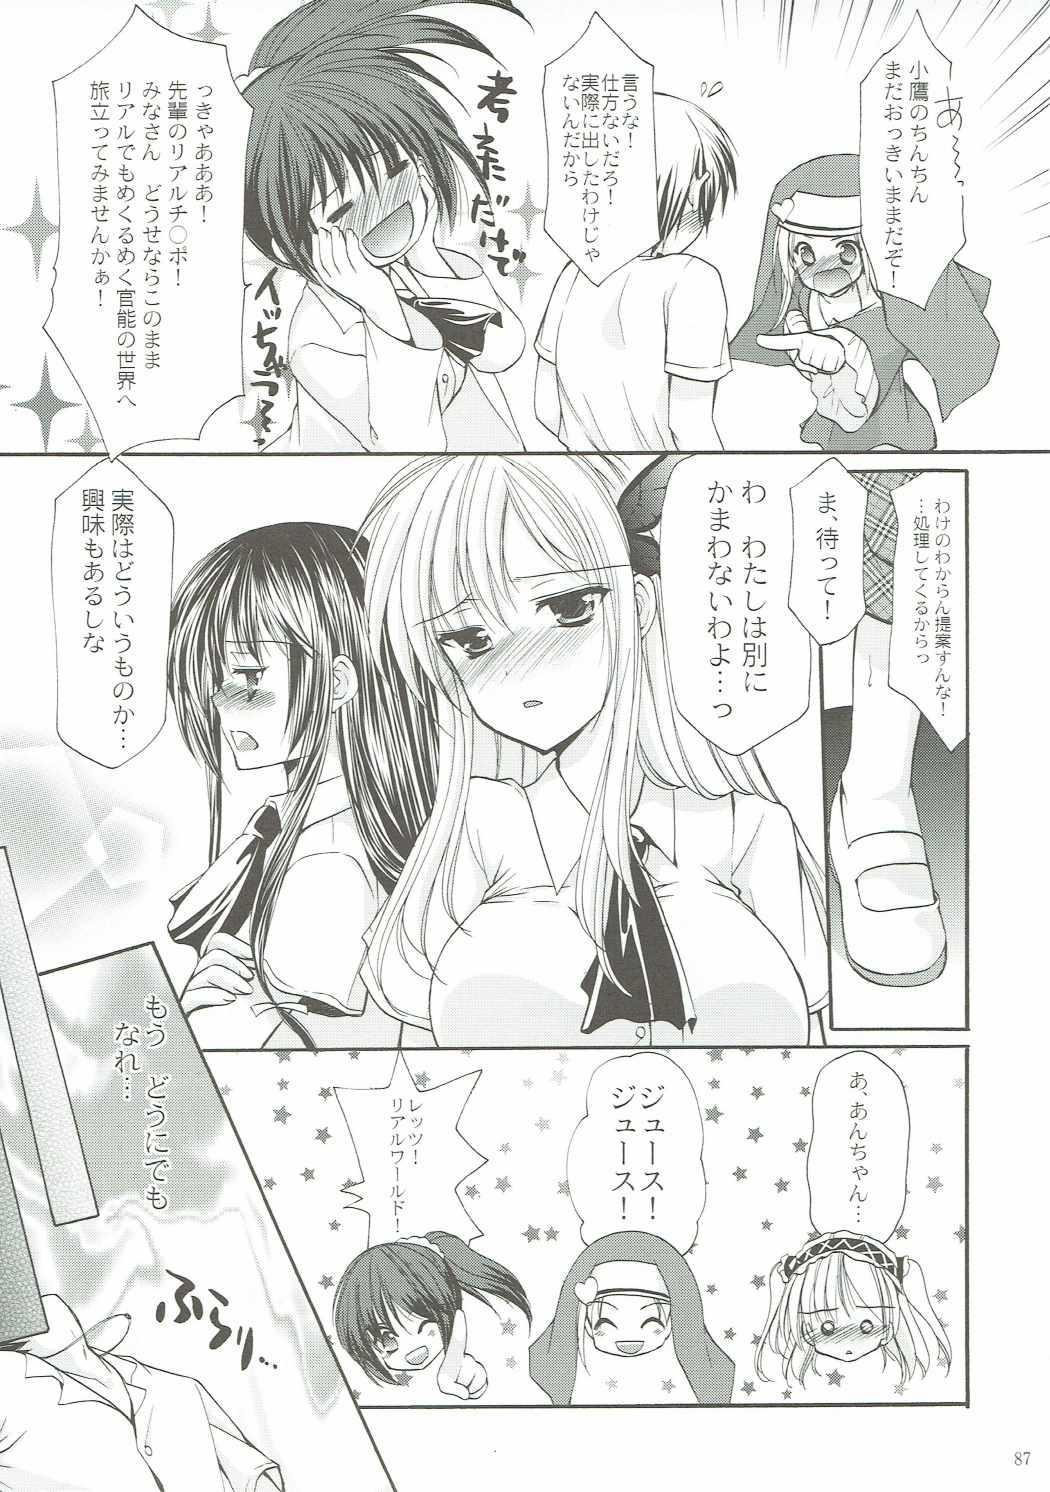 ANIME COLLECTION Imomuya Honpo - Singleton Anime Soushuuhen 85